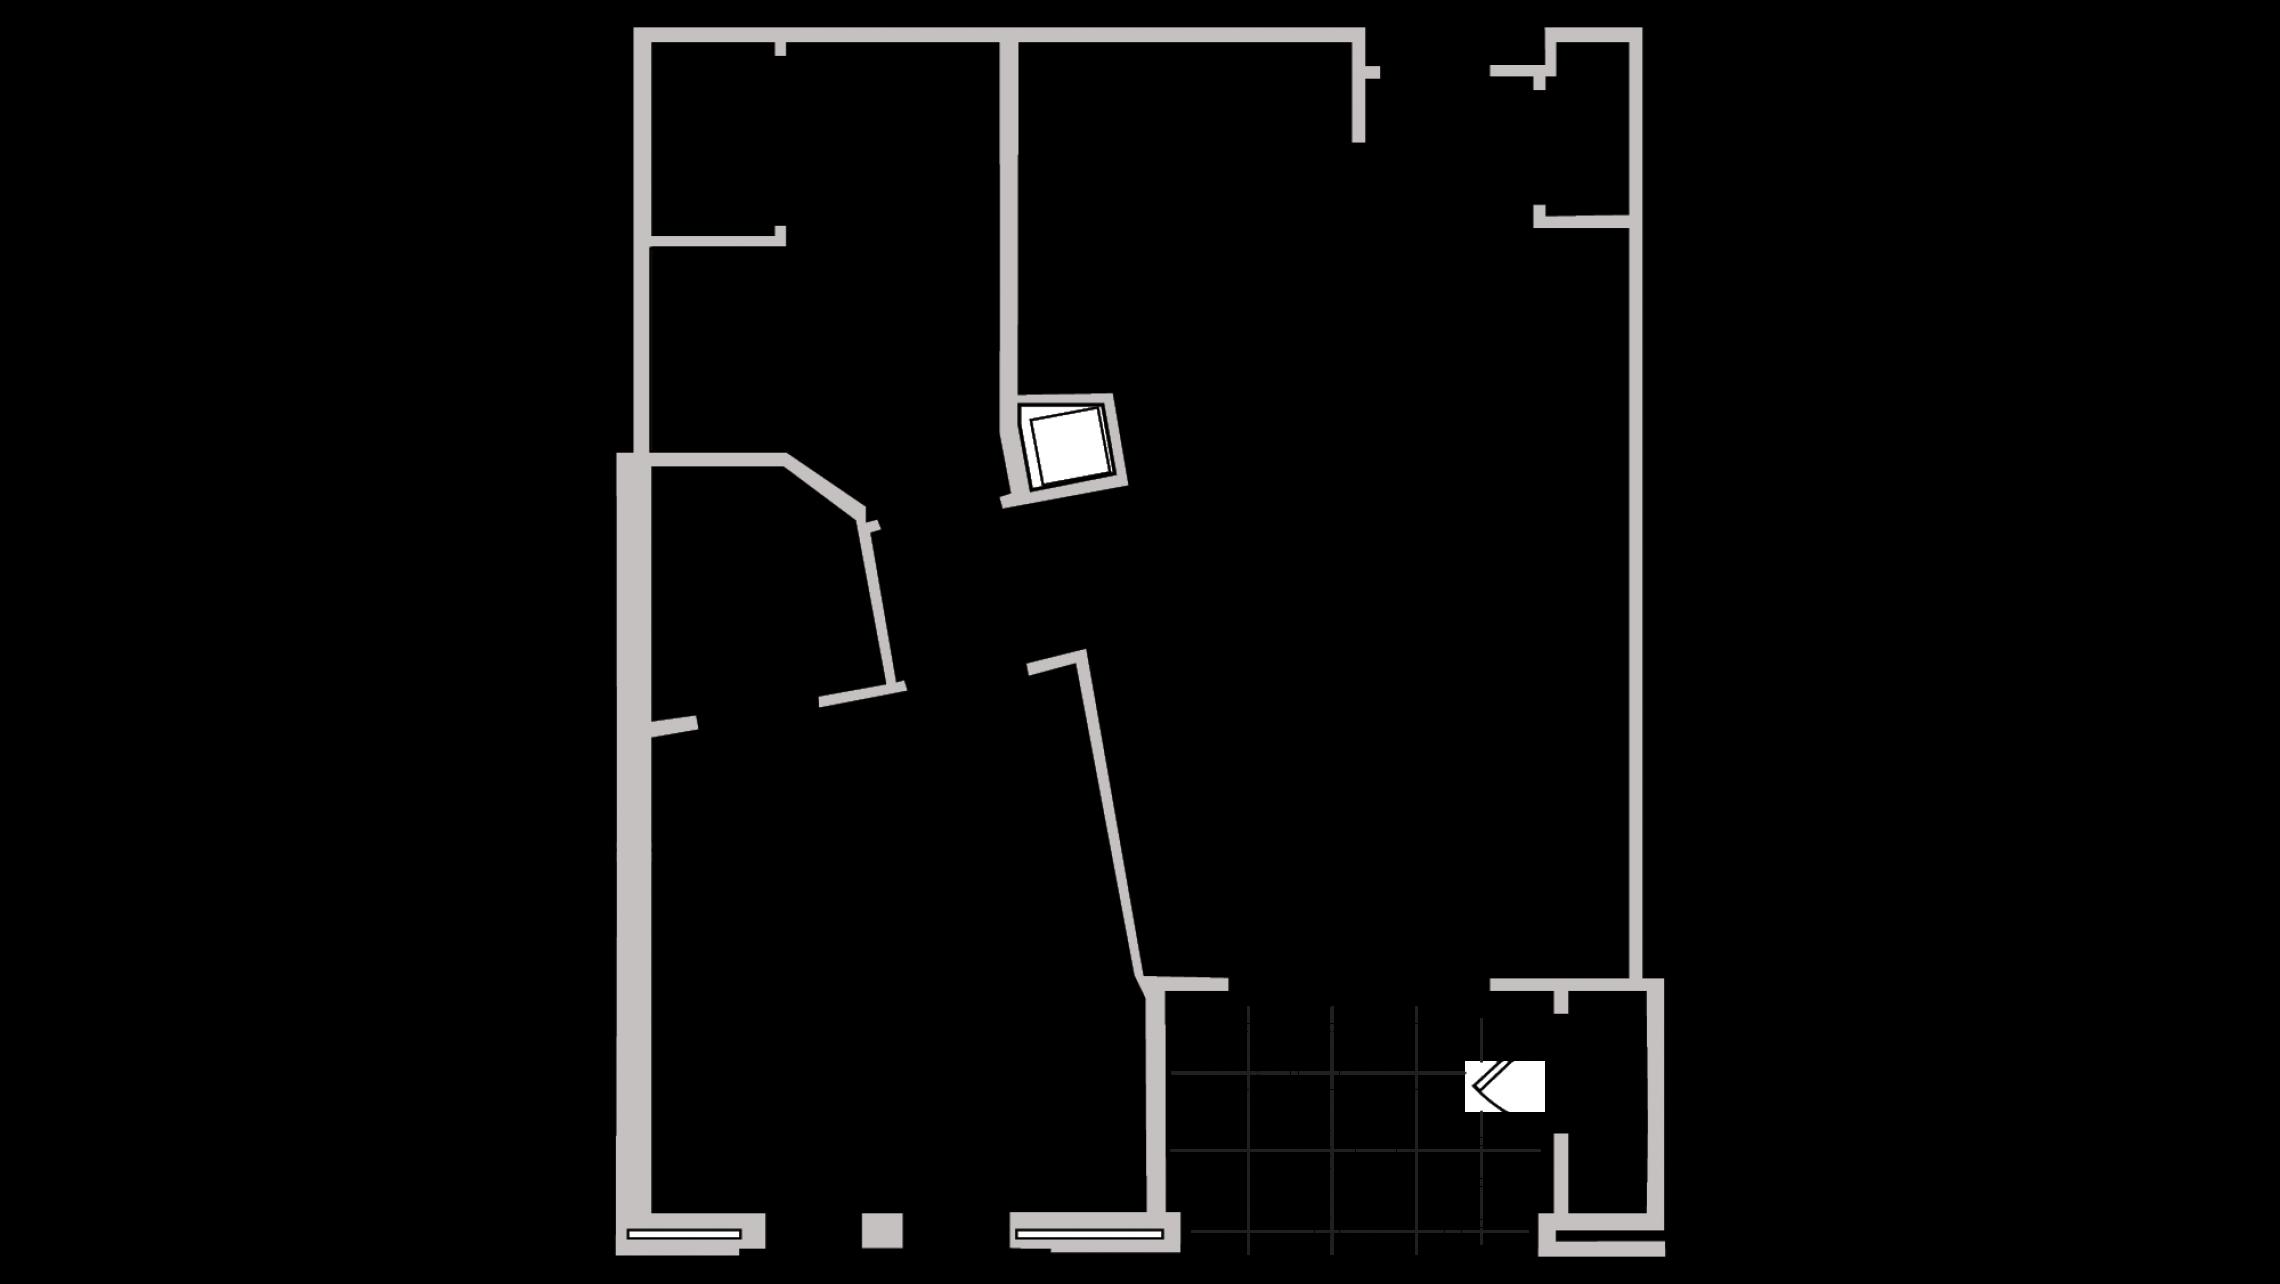 ULI The Depot 1-214 - One Bedroom, One Bathroom